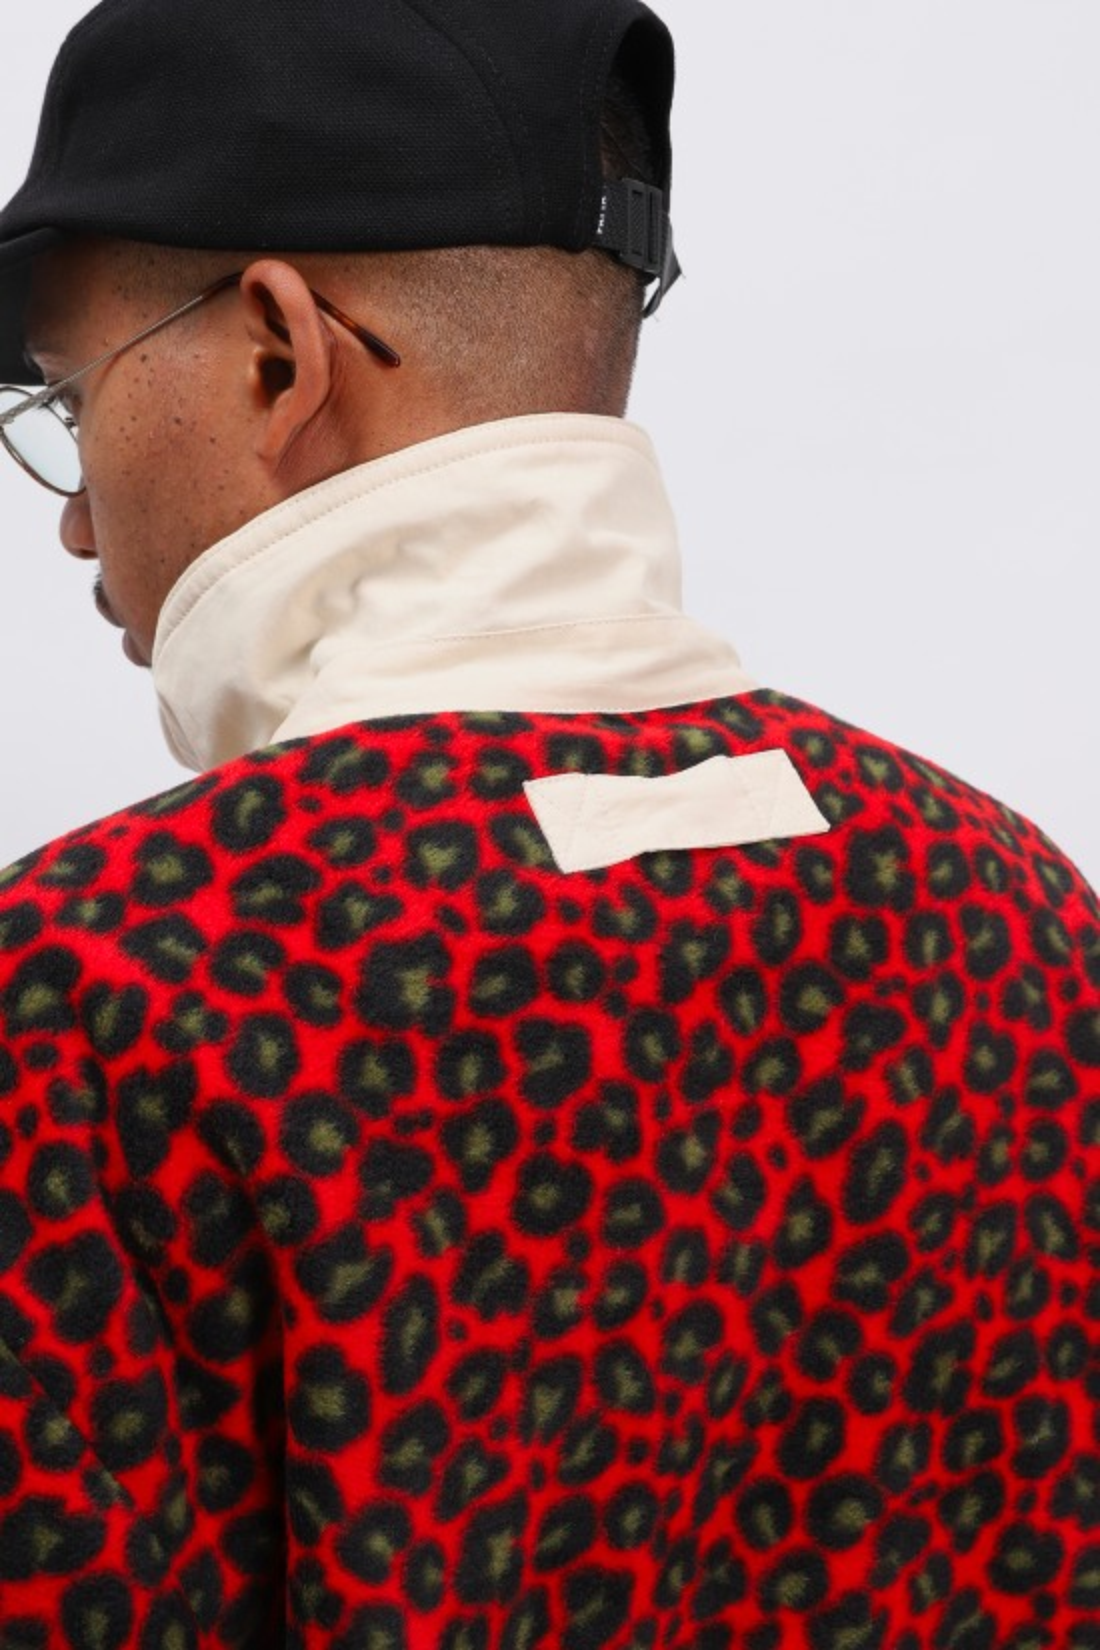 PATTA / Patta reversible jacket Grey/red leopard